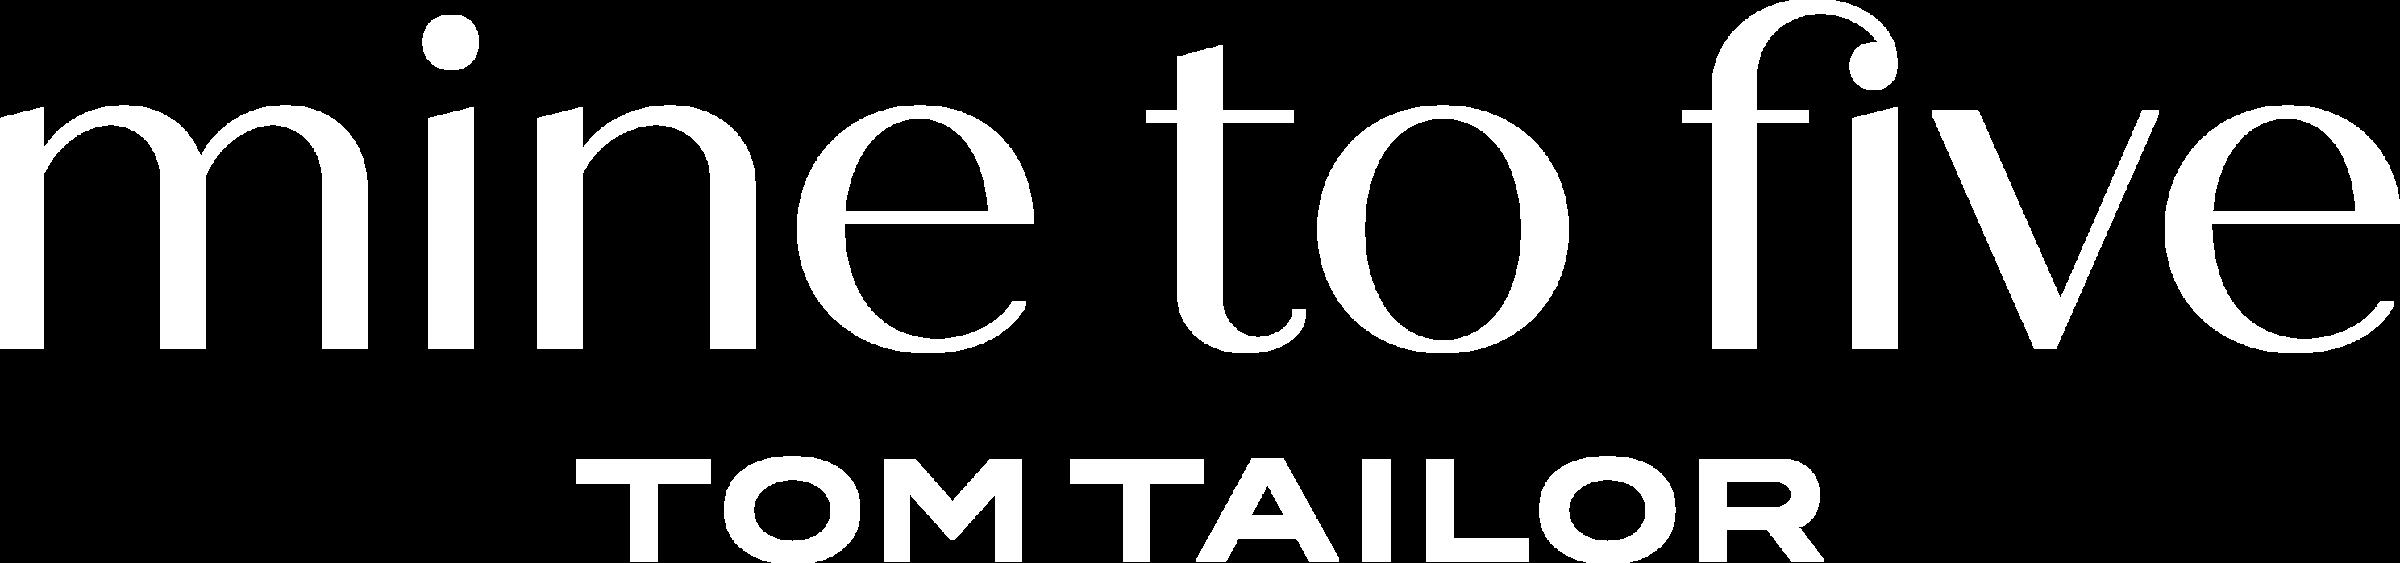 MINE TO FIVE Logo